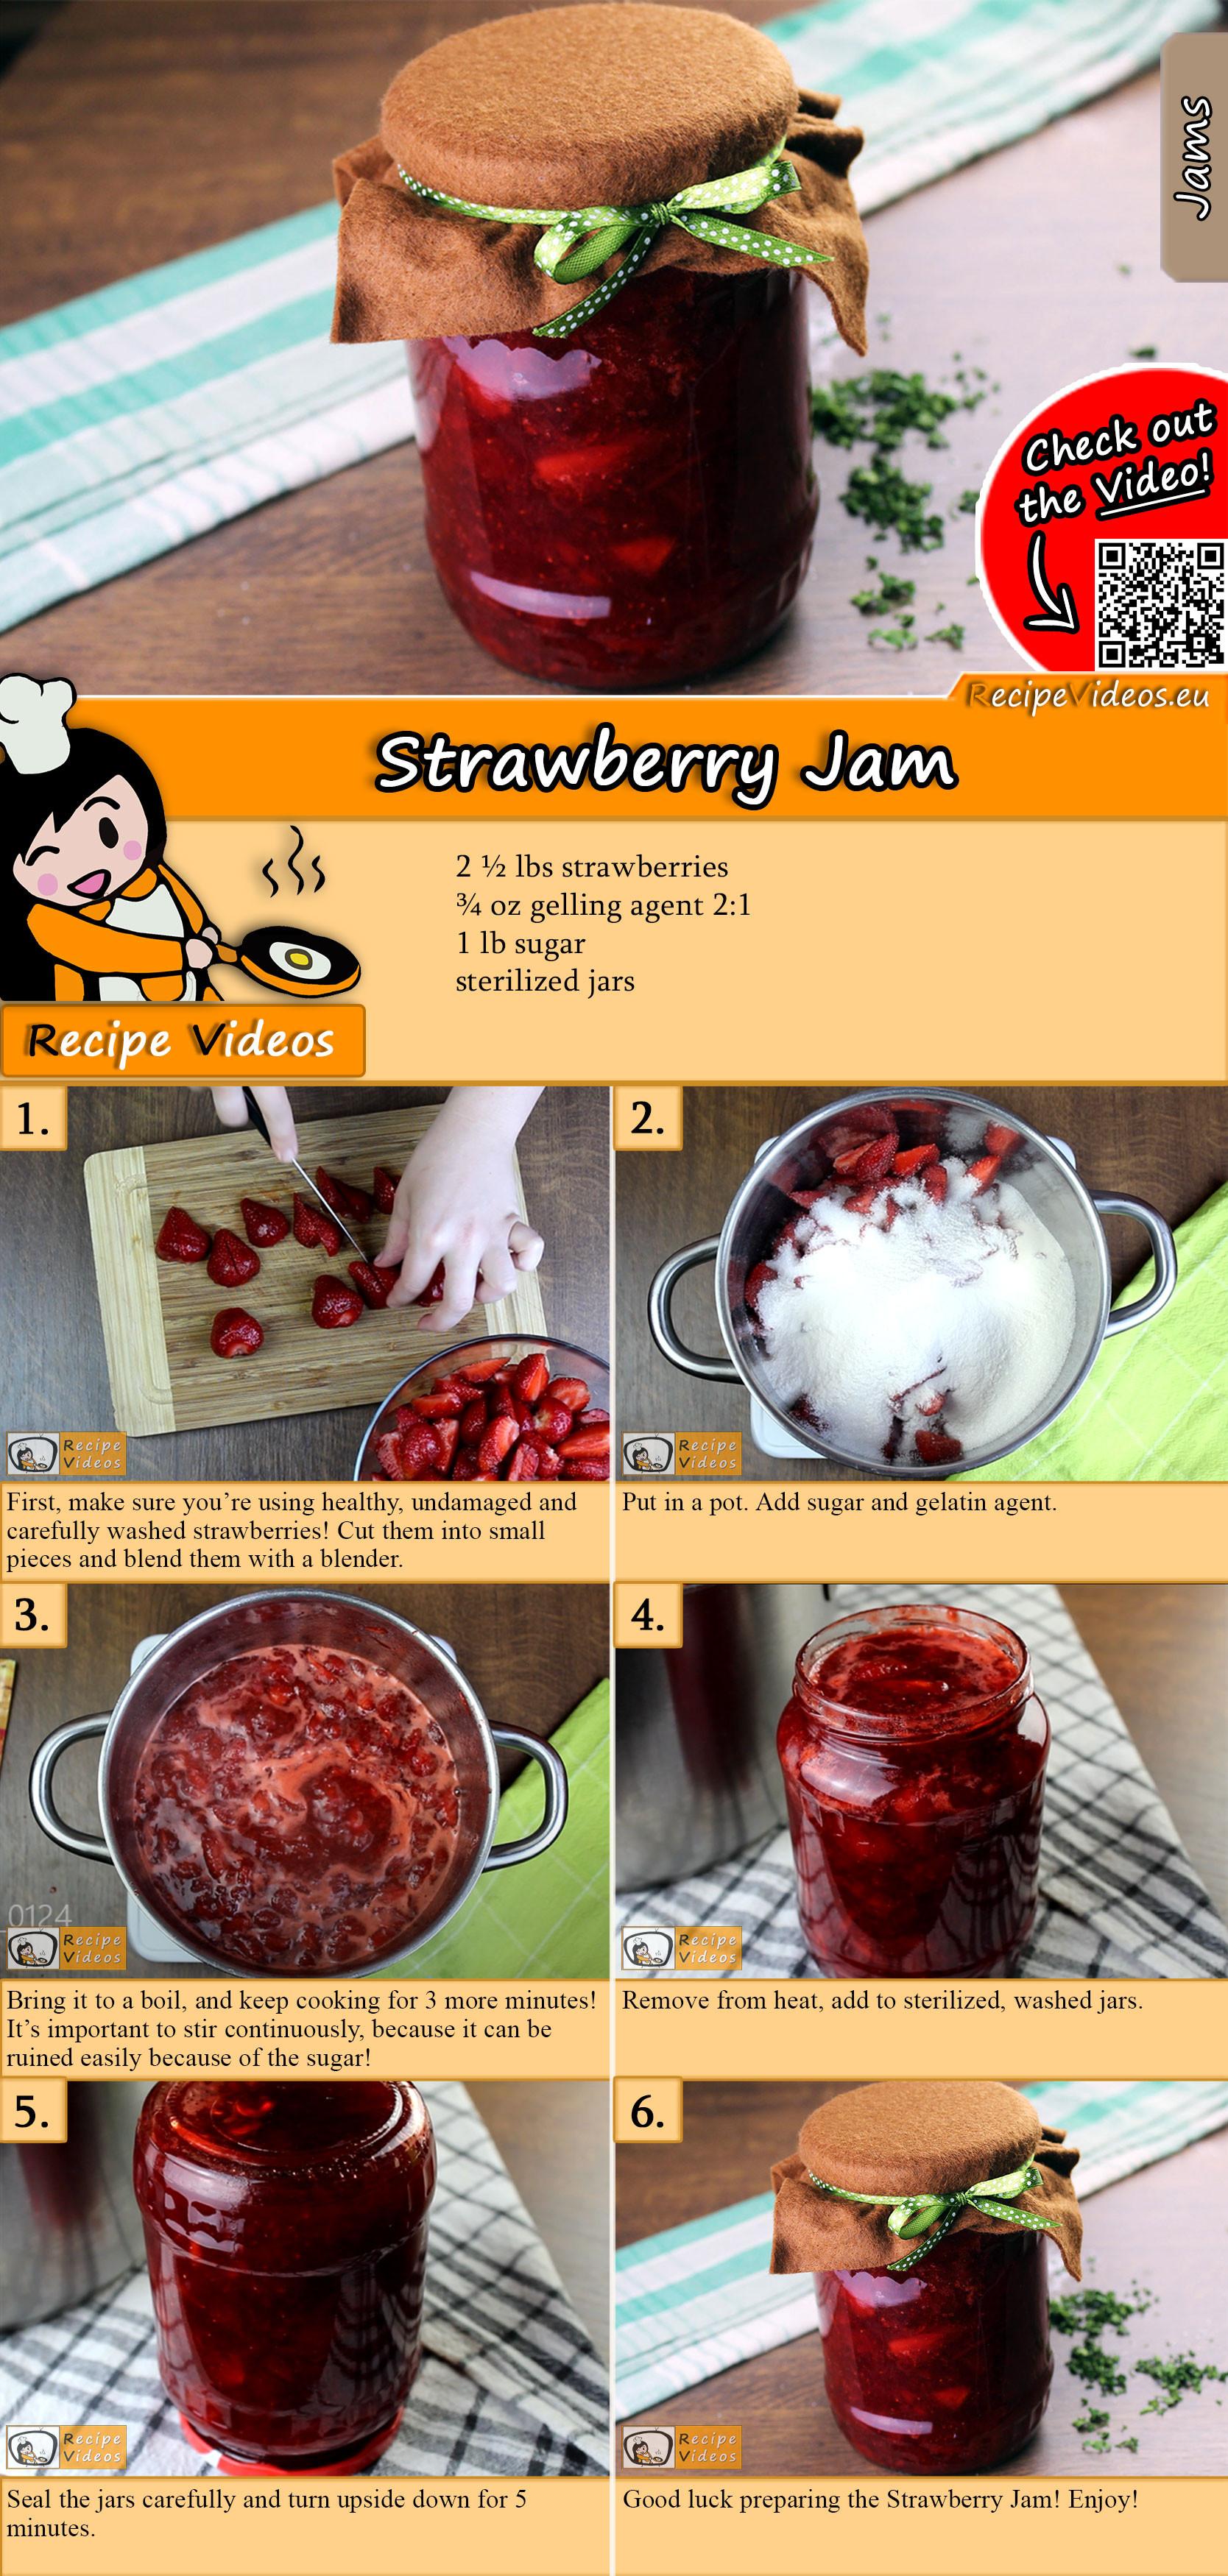 Strawberry Jam recipe with video